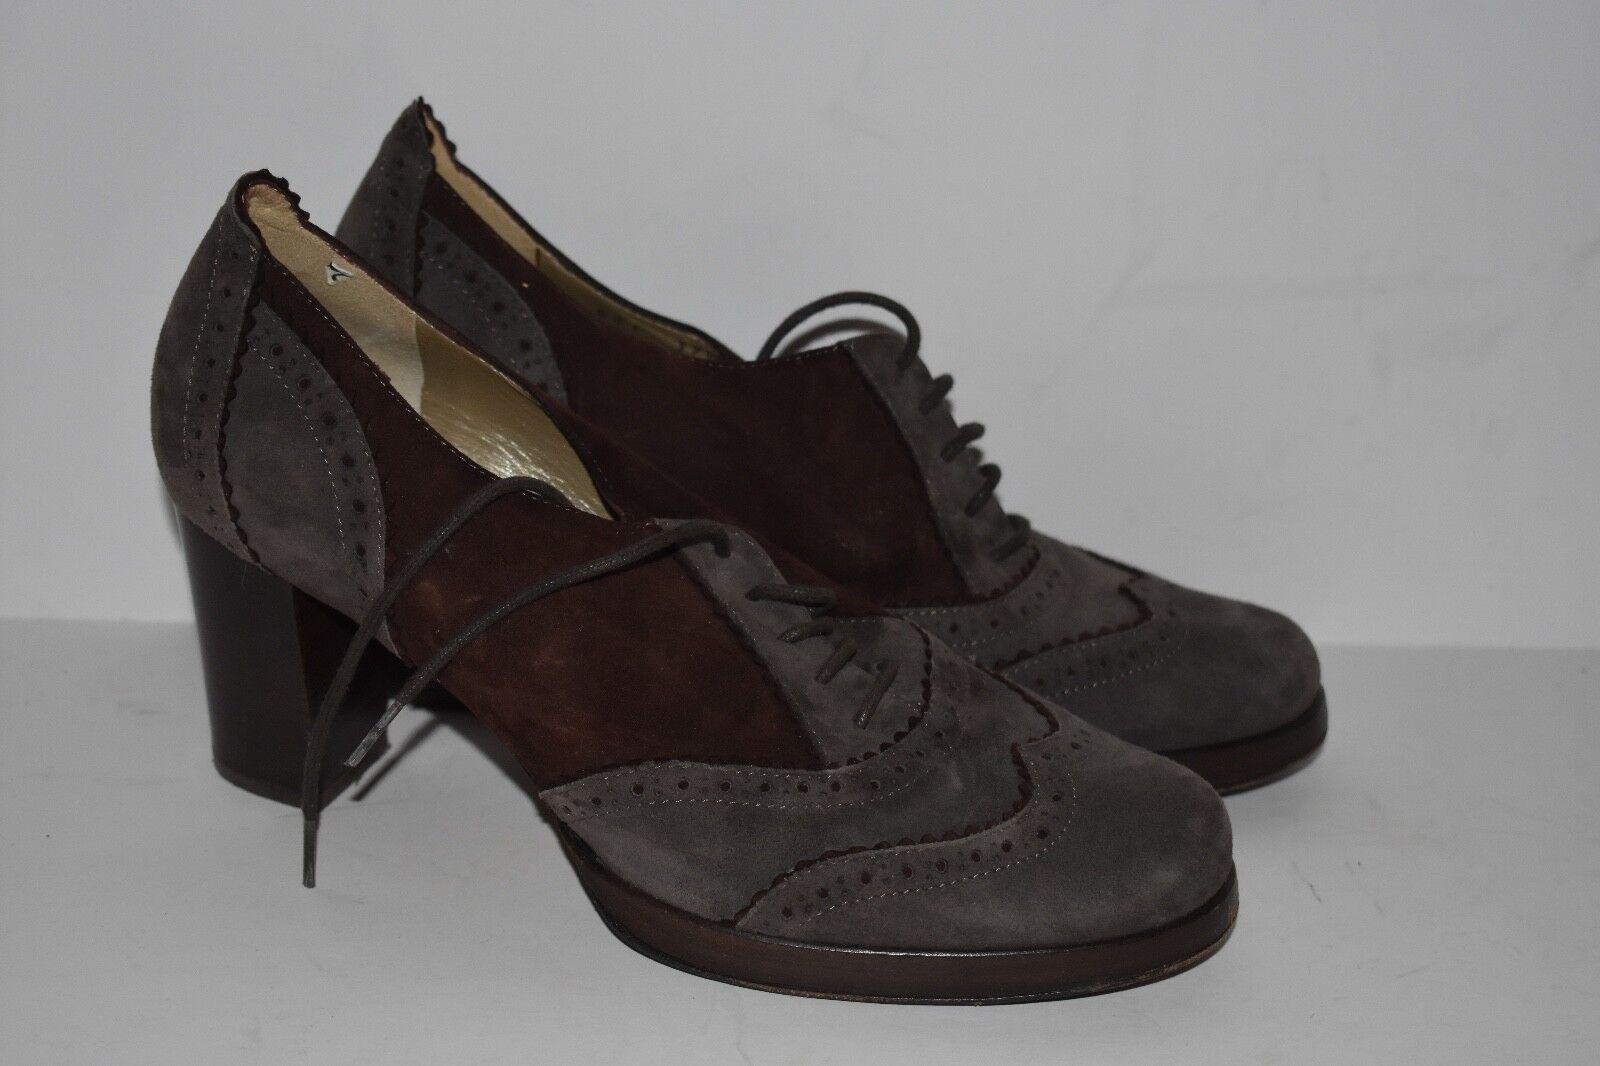 Taryn pink Women's Heel Booties Heels Lace Up shoes Pumps Size 37.5